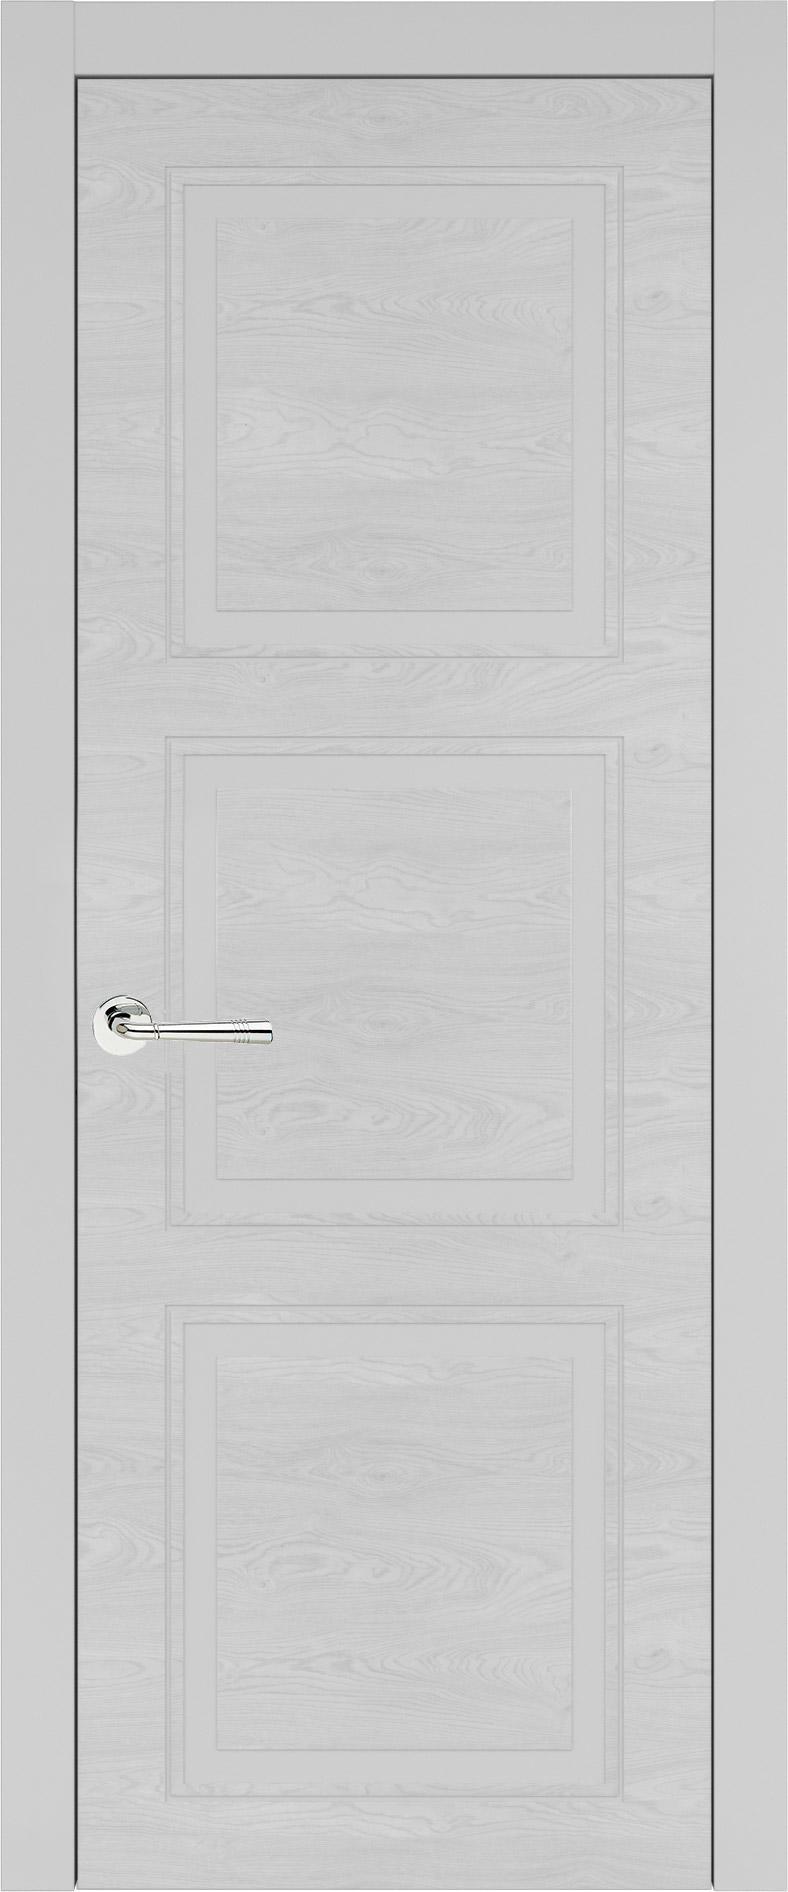 Milano Neo Classic цвет - Серая эмаль по шпону (RAL 7047) Без стекла (ДГ)